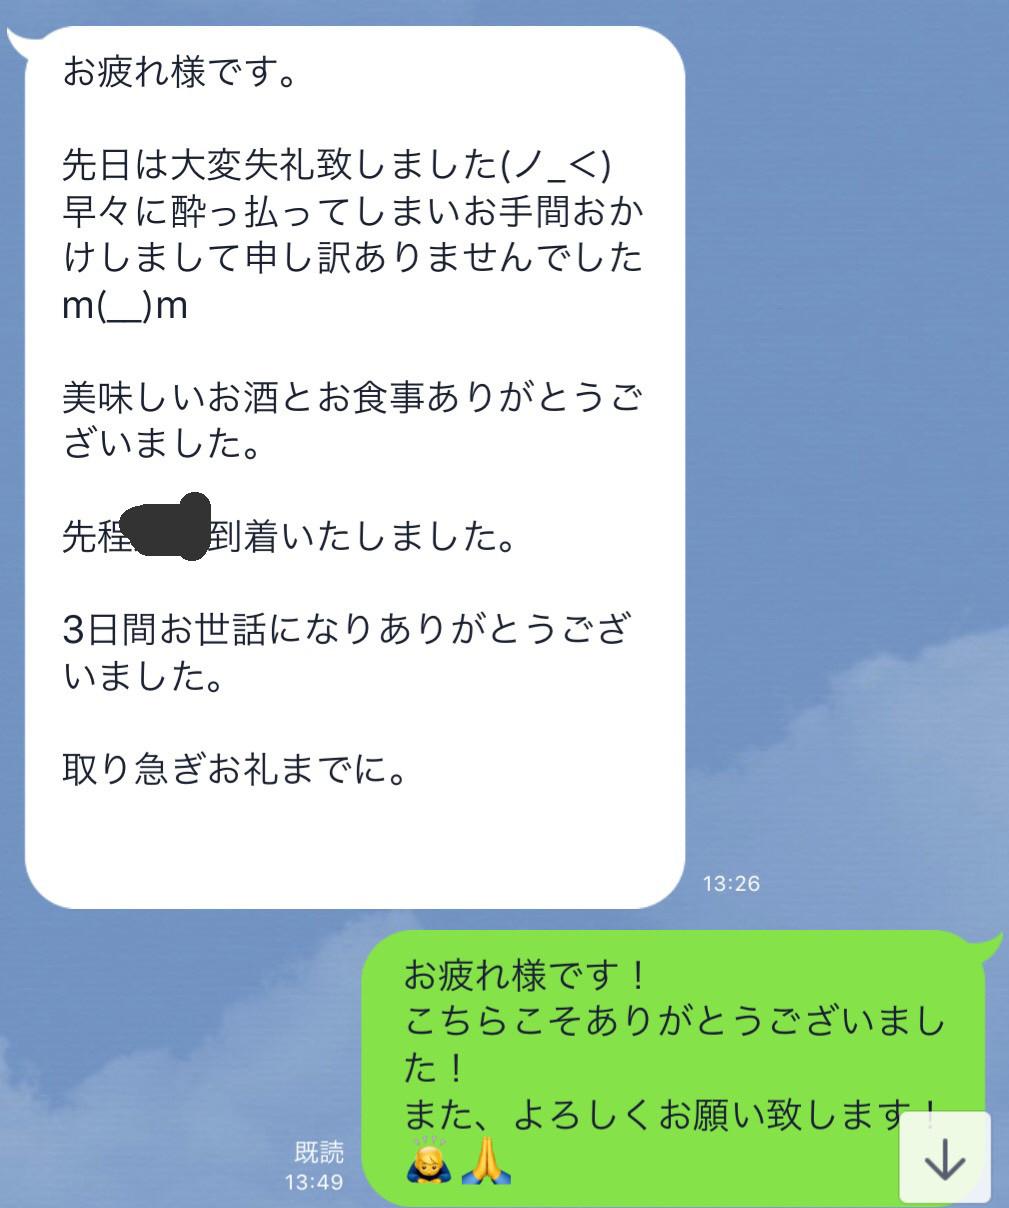 S__12730382